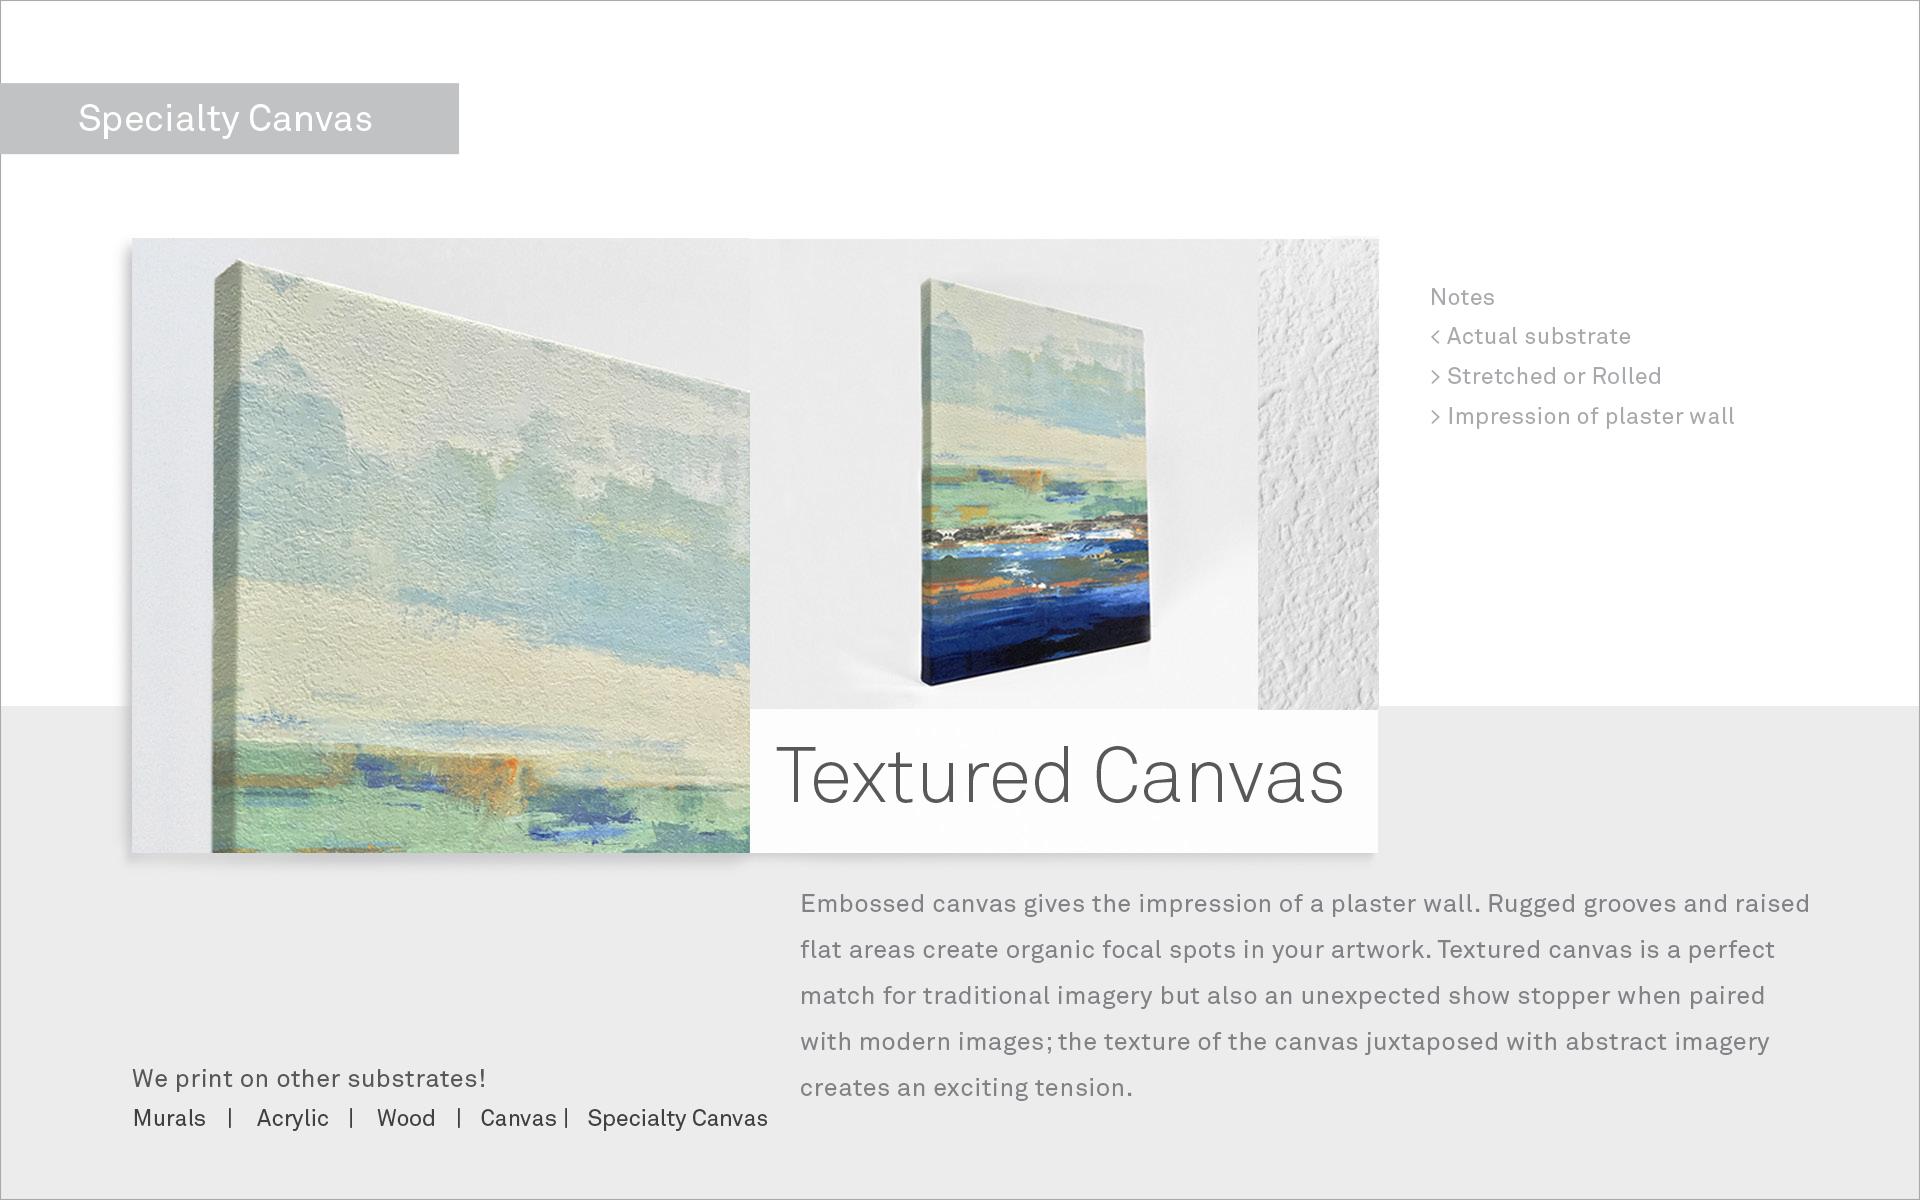 SpecialtyCanvas_Textured